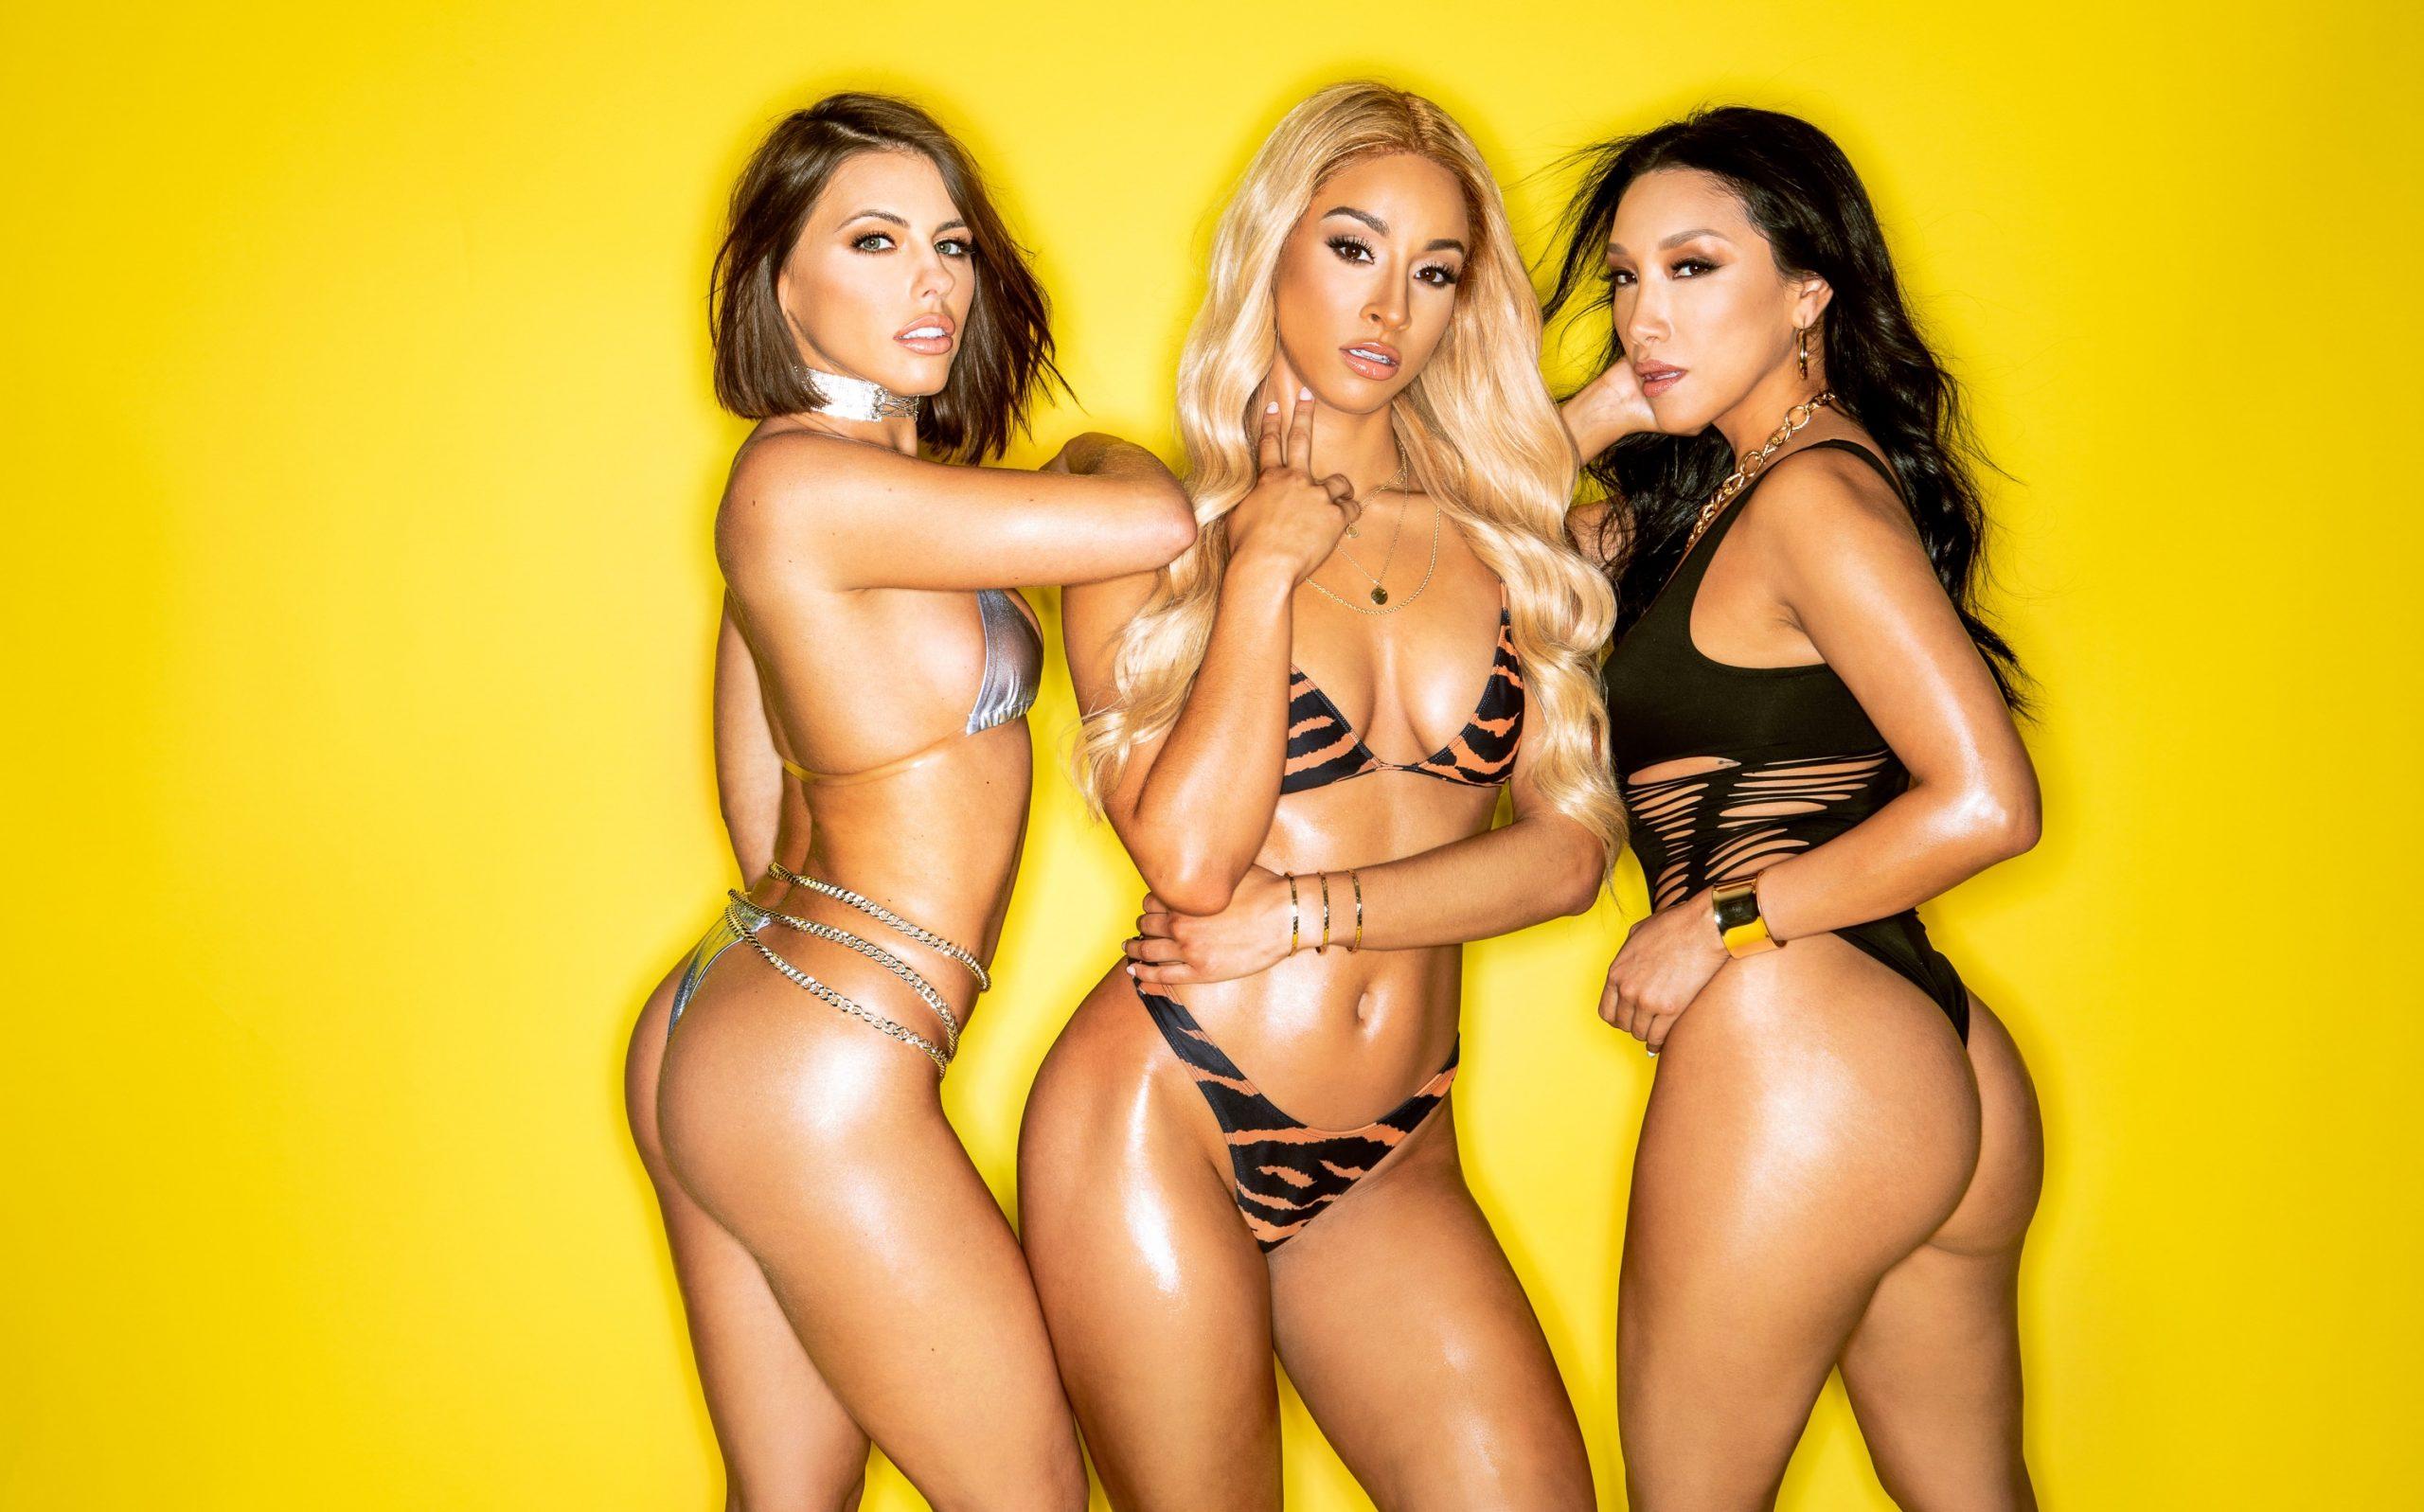 Teanna, Vicki & Adriana Chechik